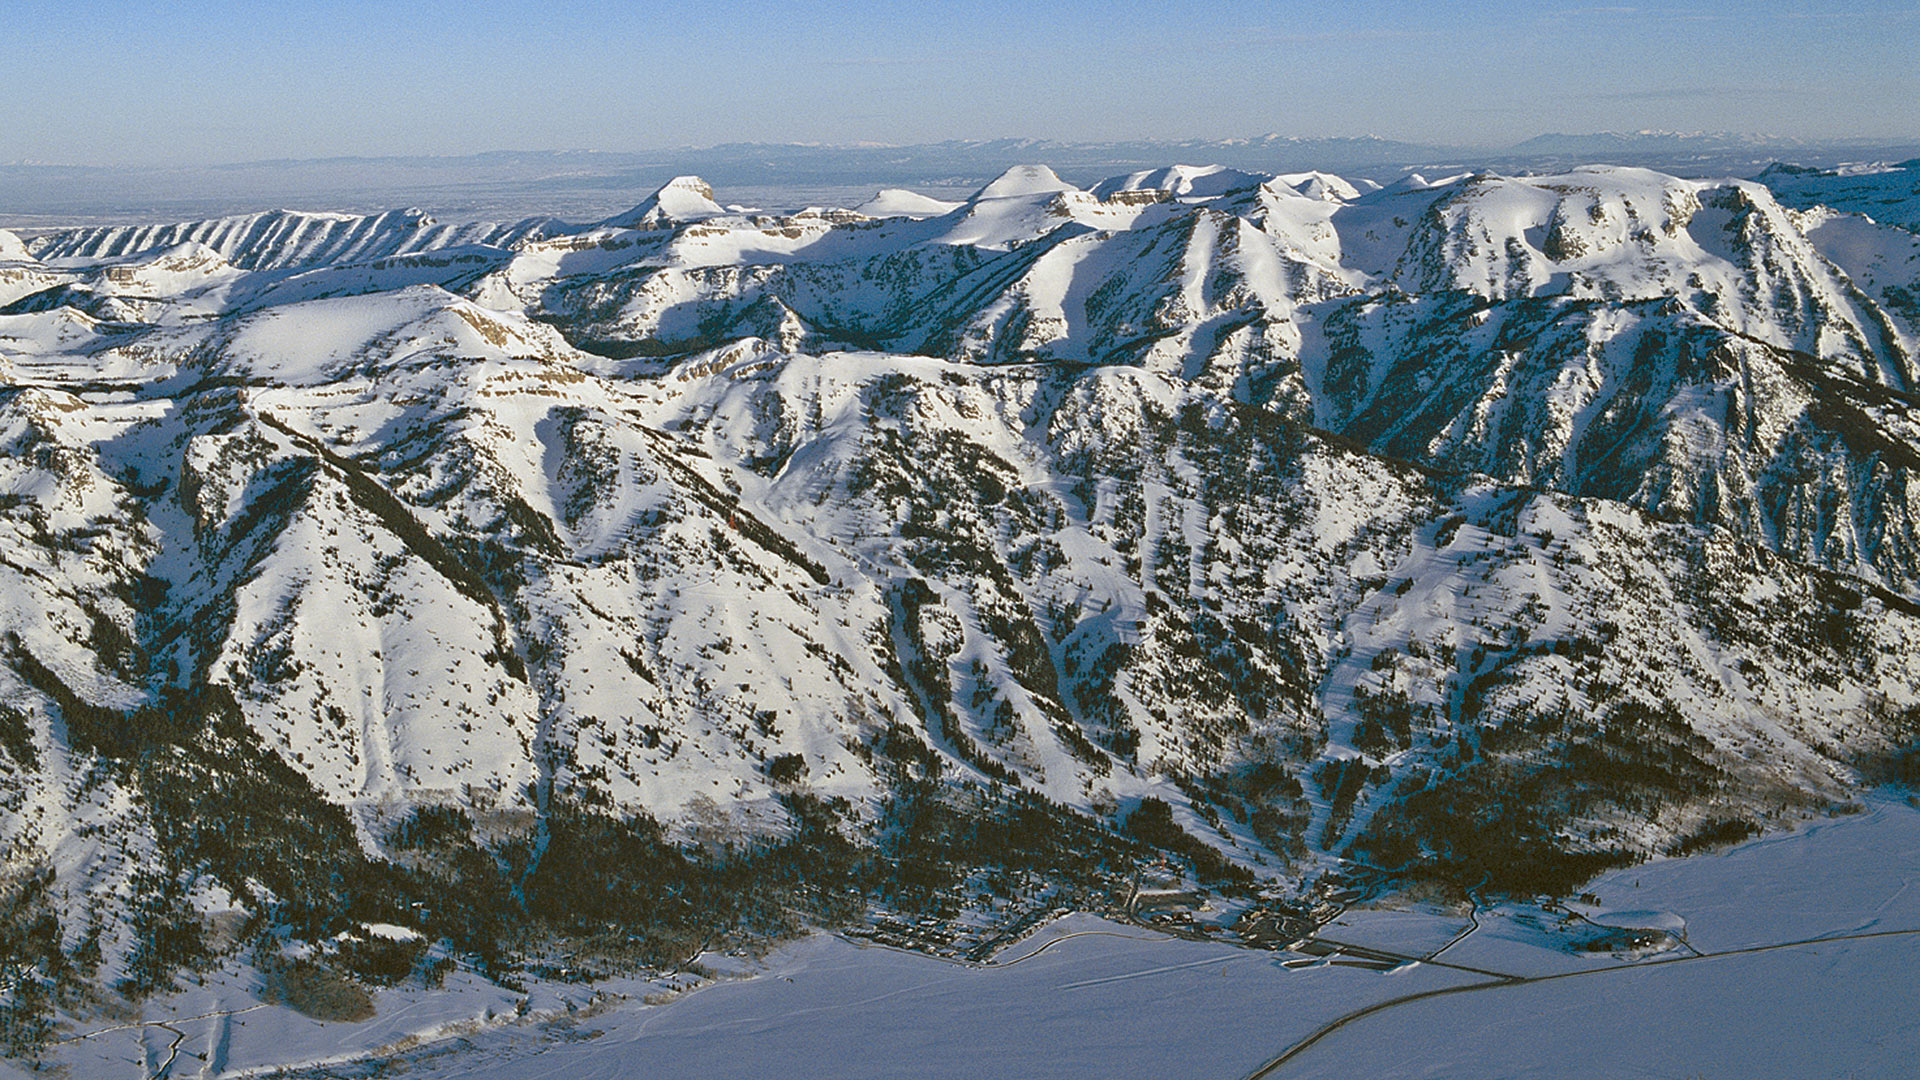 jackson-hole-mountain-resort-2ARW1001